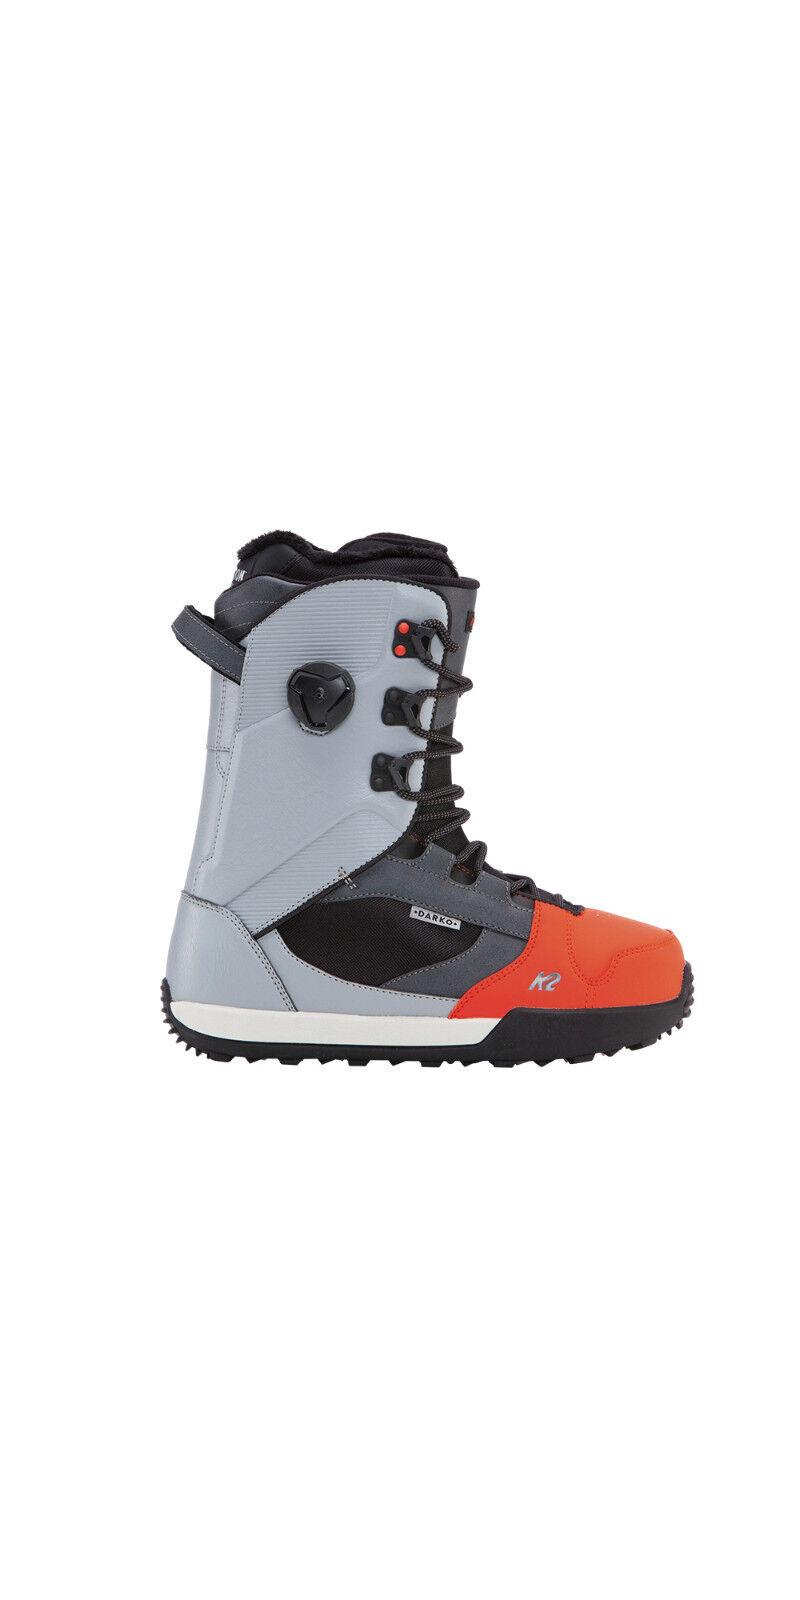 Stiefel Snowboard Stiefel K2 Darko conda grau 2018